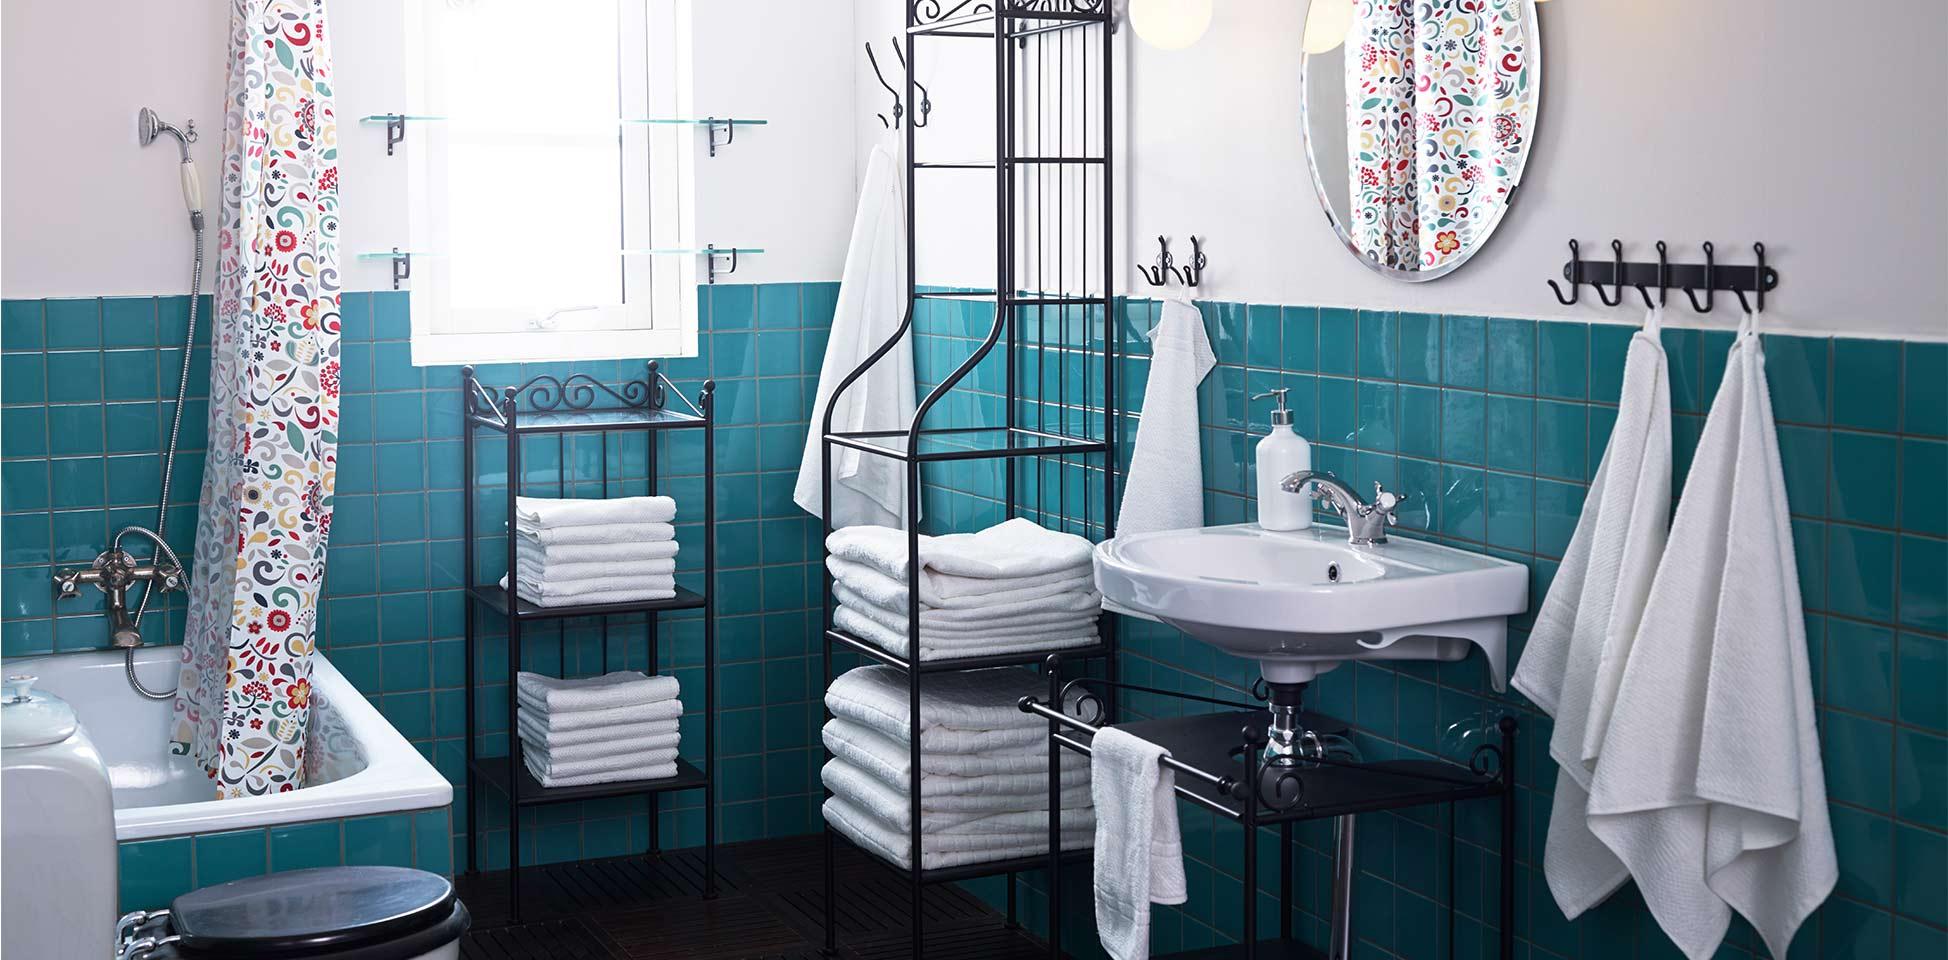 Grupo inventia opiniones grupo inventia c mo deben ser las toallas de ba o - Toallas para bano ...